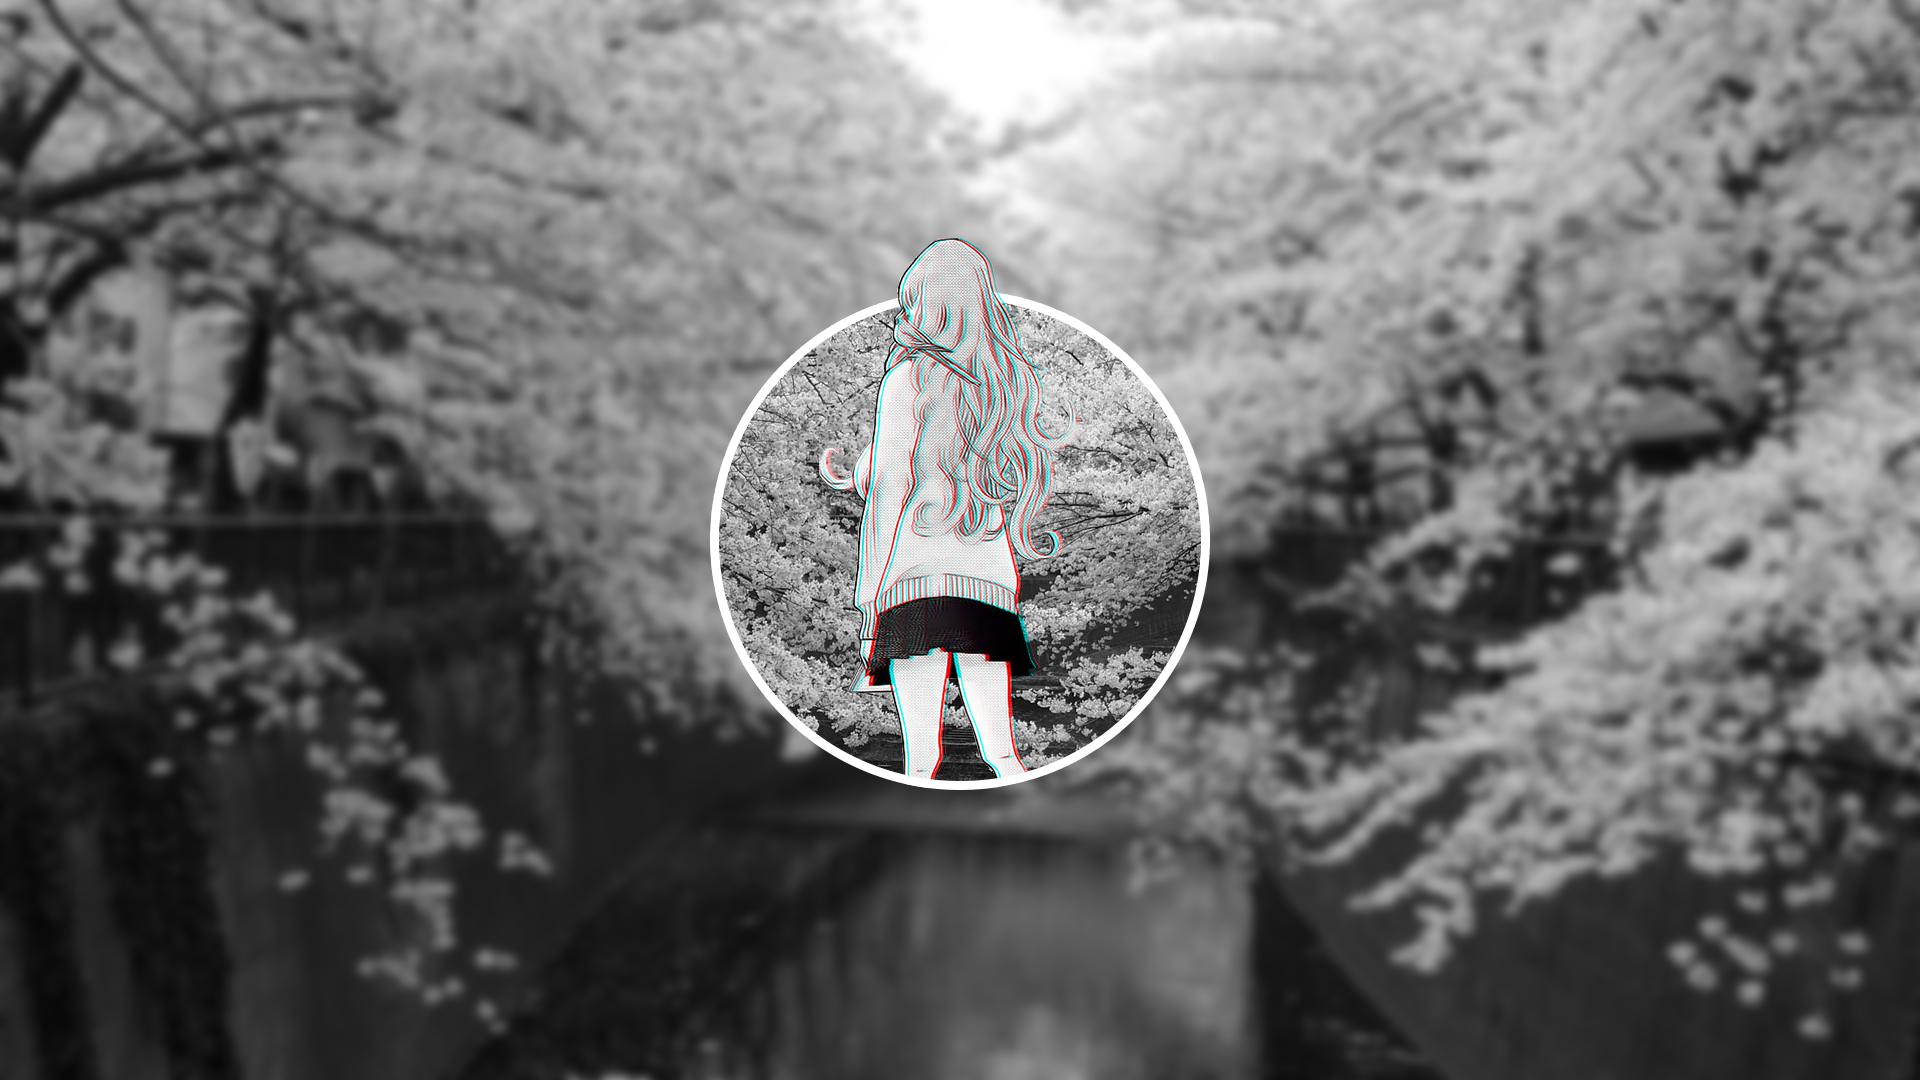 Anime 1920x1080 anime girls nature blurred glitch art monochrome anime